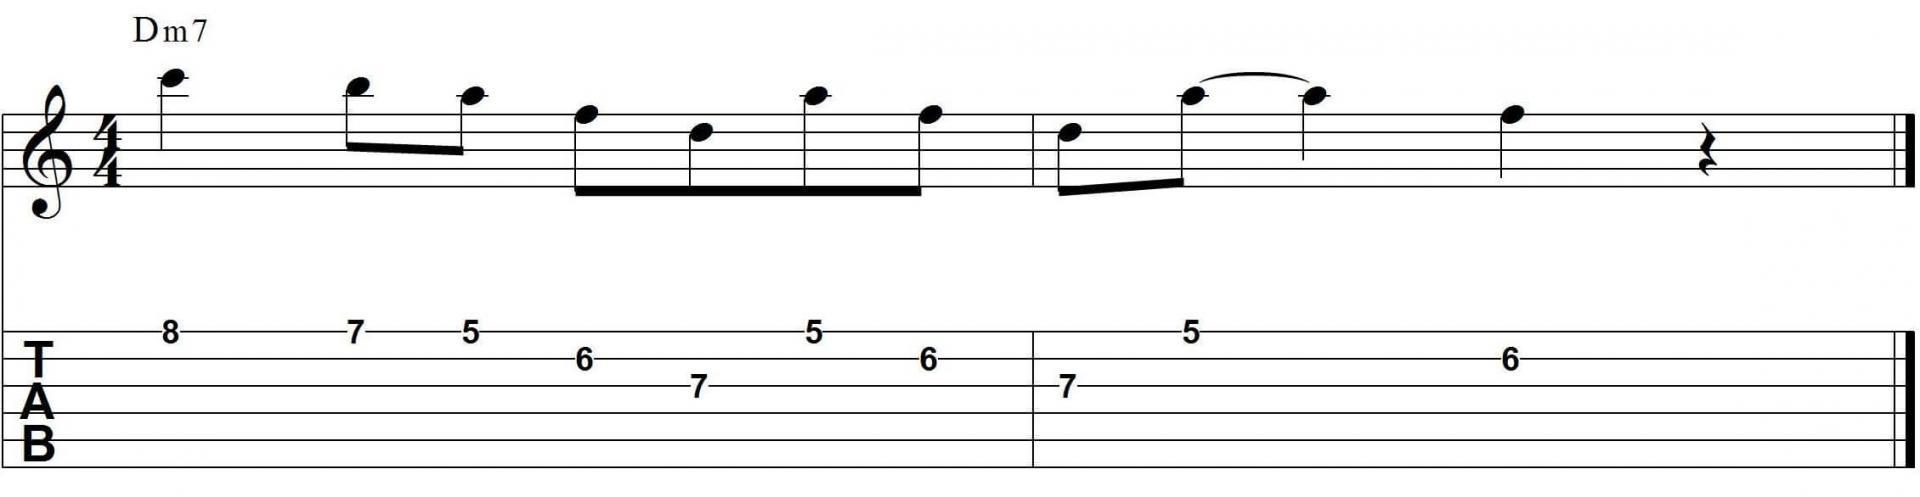 Minor jazz guitar pattern with tab 1